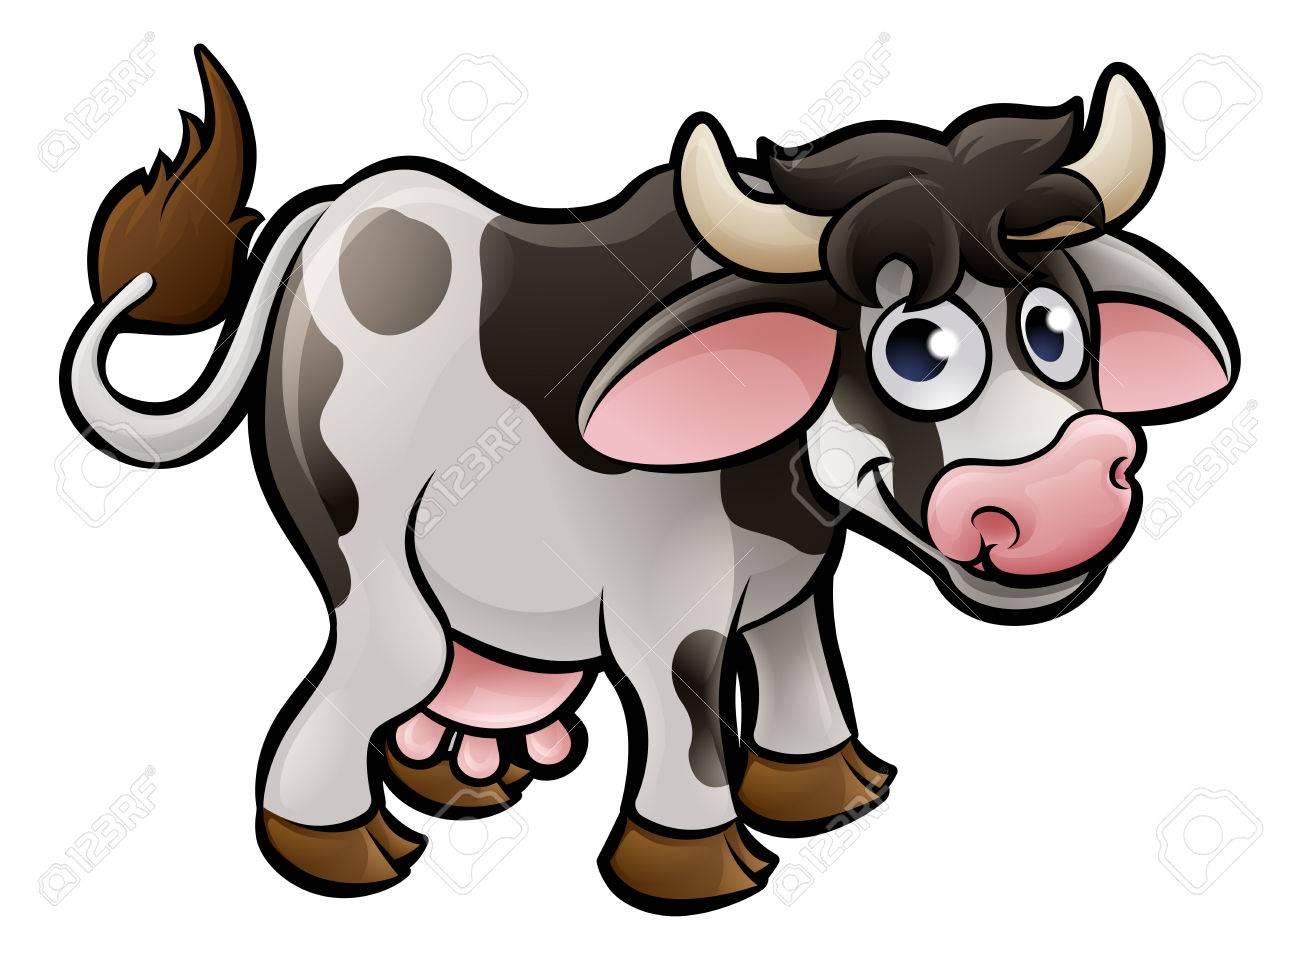 1300x960 A Cow Farm Animals Cartoon Character Royalty Free Cliparts